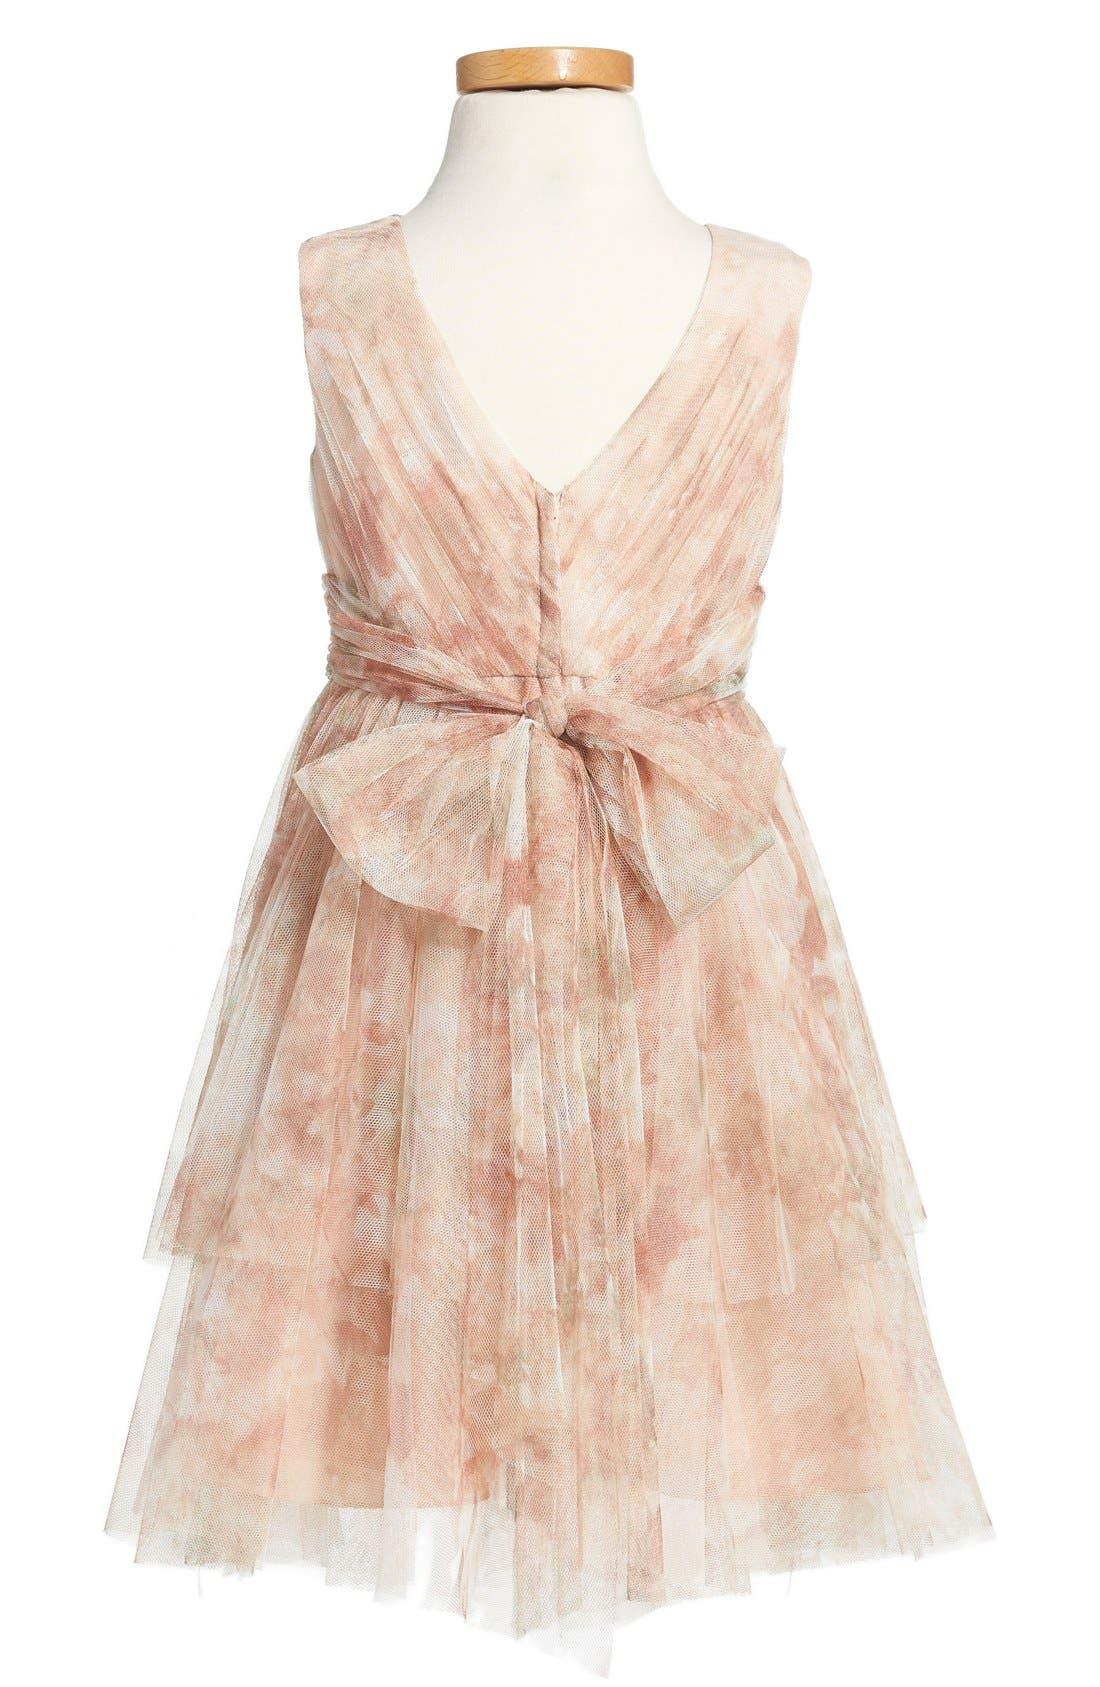 Etsy - Vintage Floral Tulle Dress,                             Alternate thumbnail 2, color,                             Blush Multi